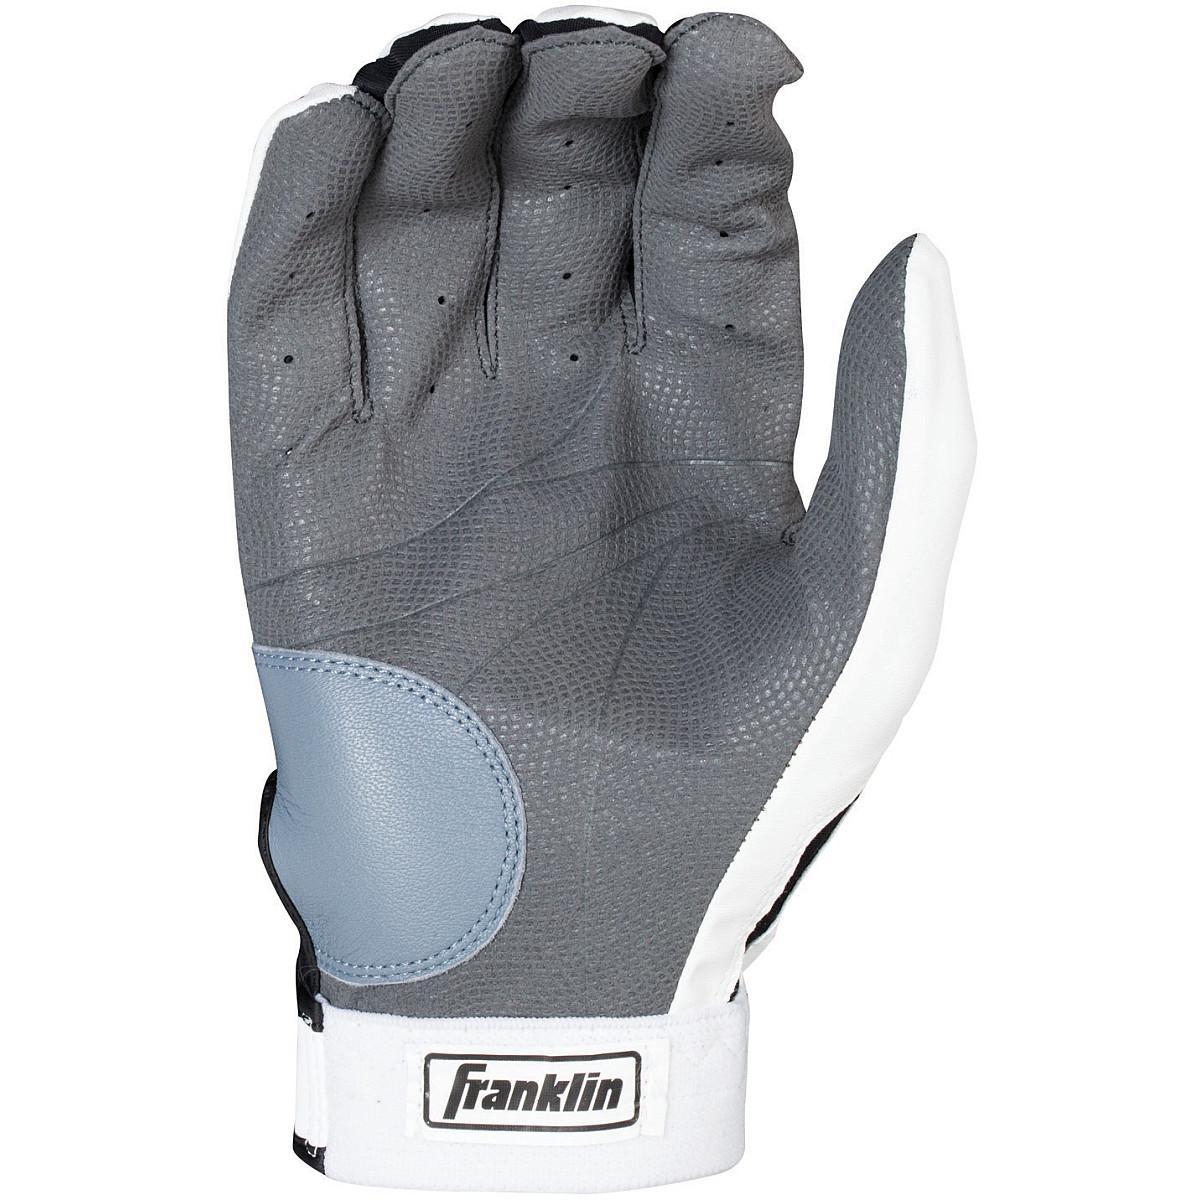 Franklin-Adult-Digitek-Baseball-Batting-Gloves thumbnail 10